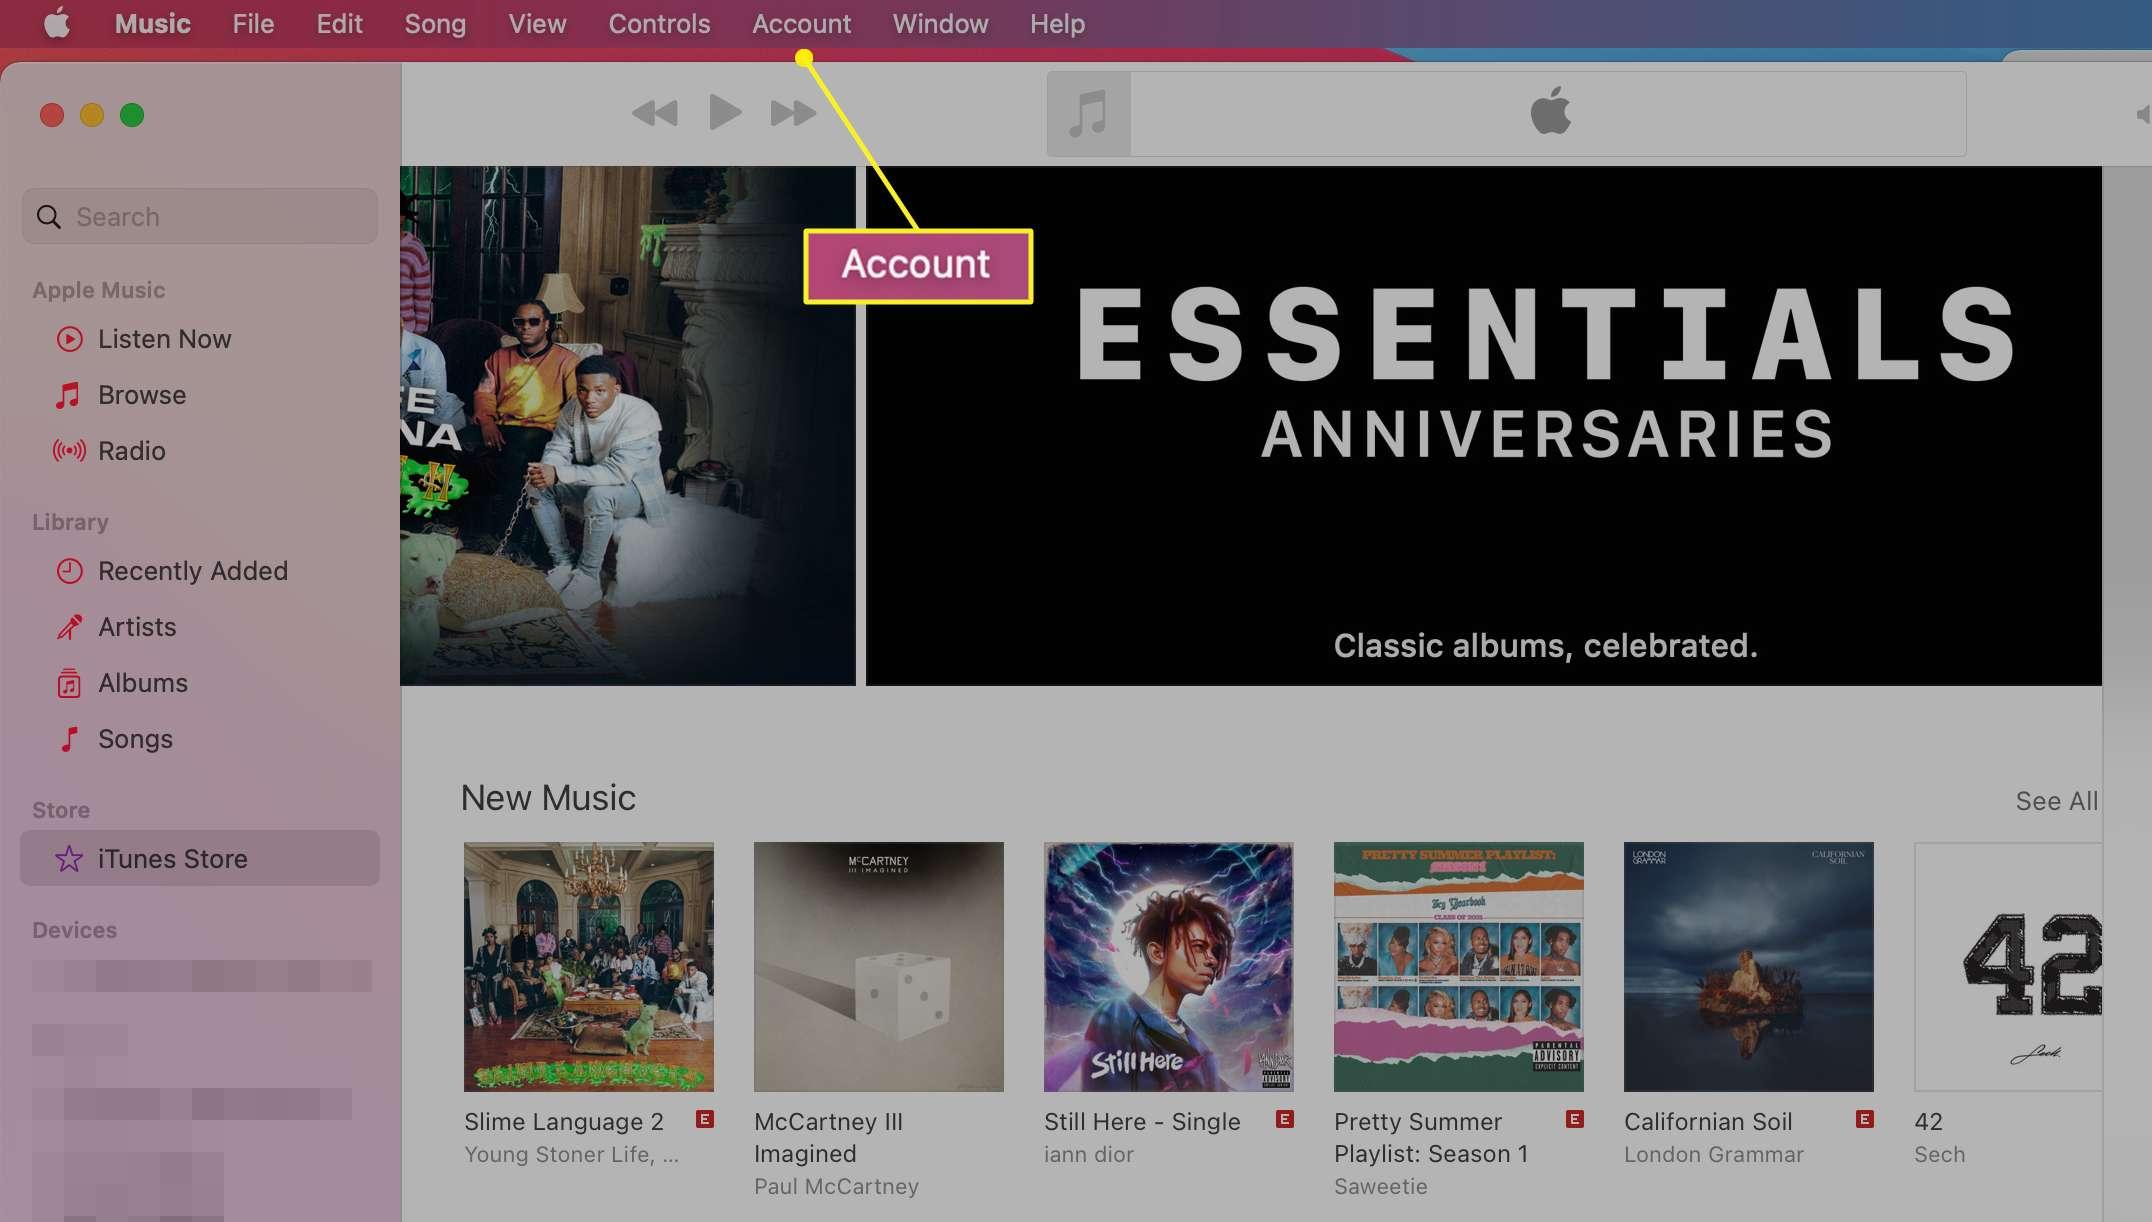 Big Sur Music App showing Account in the menu bar